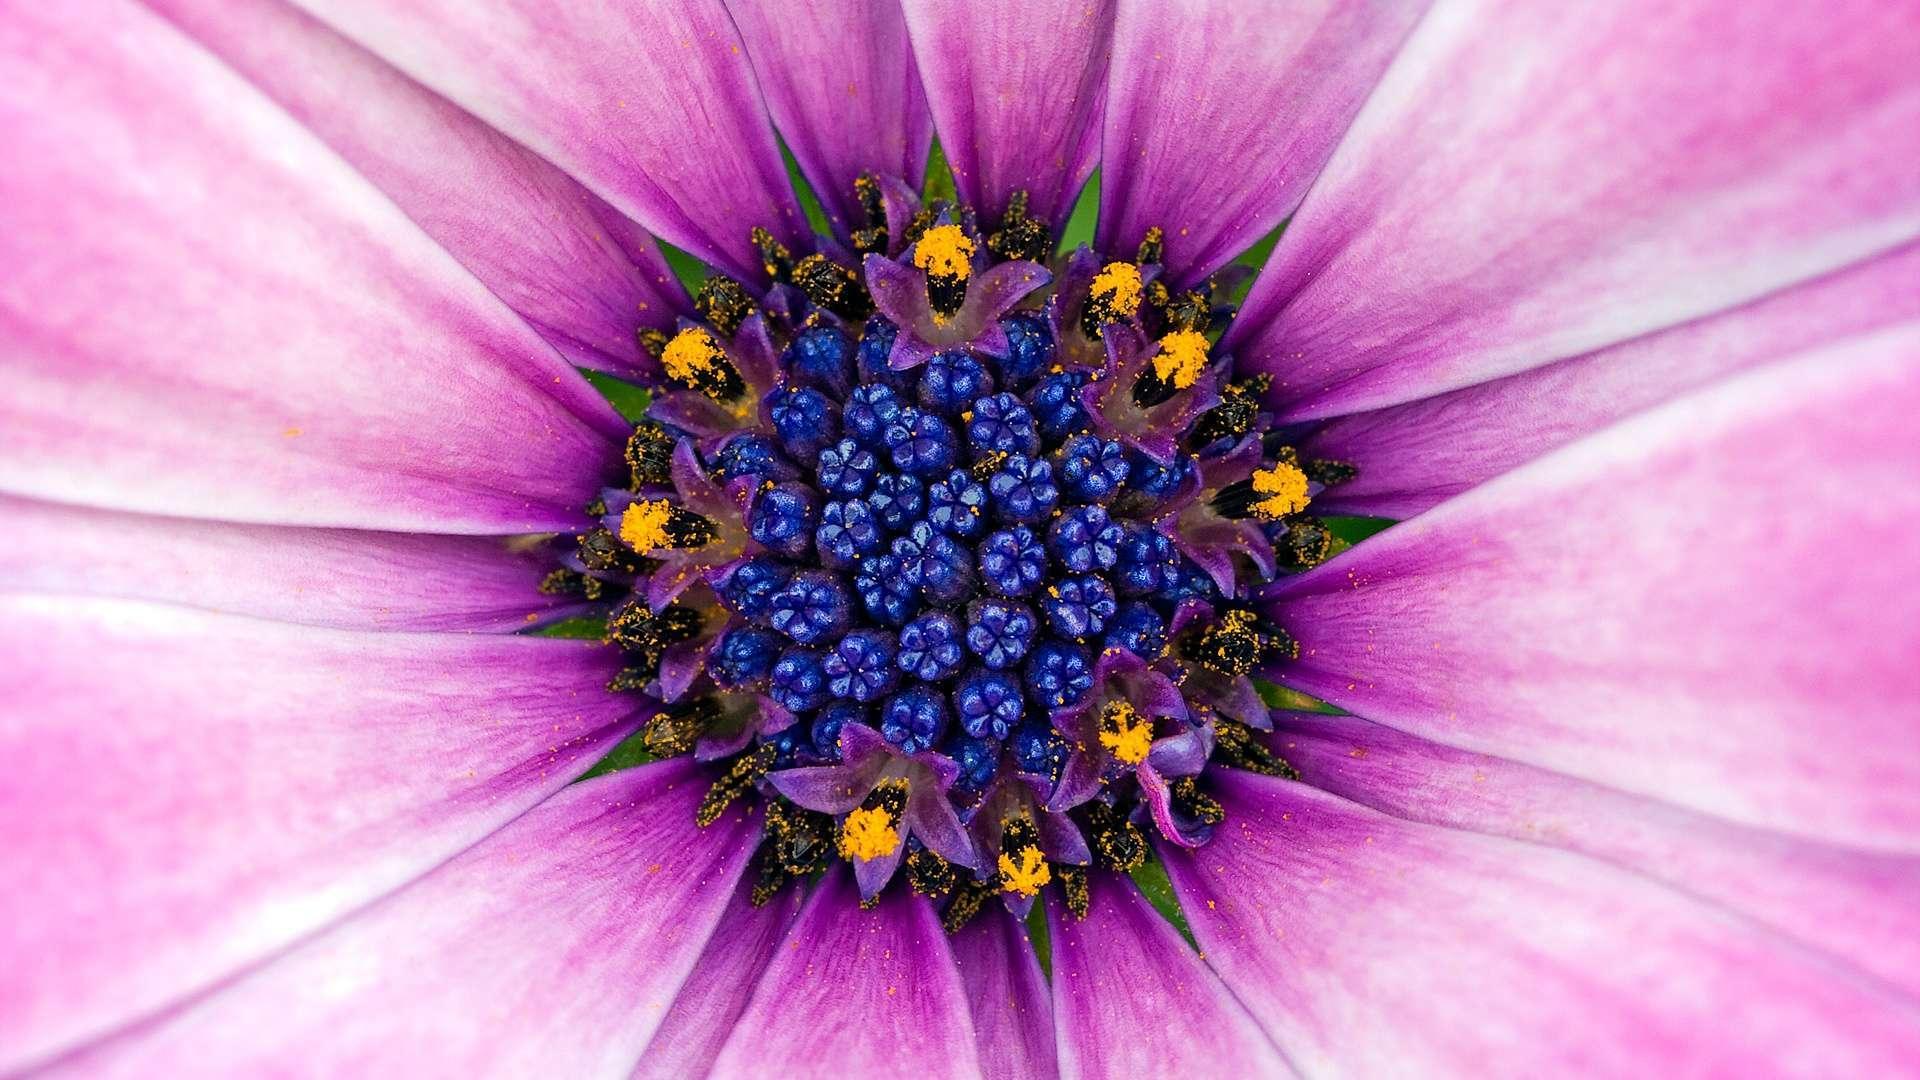 Amazing-Purple-Flower-HD-1080p-wallpaper-wp3602405